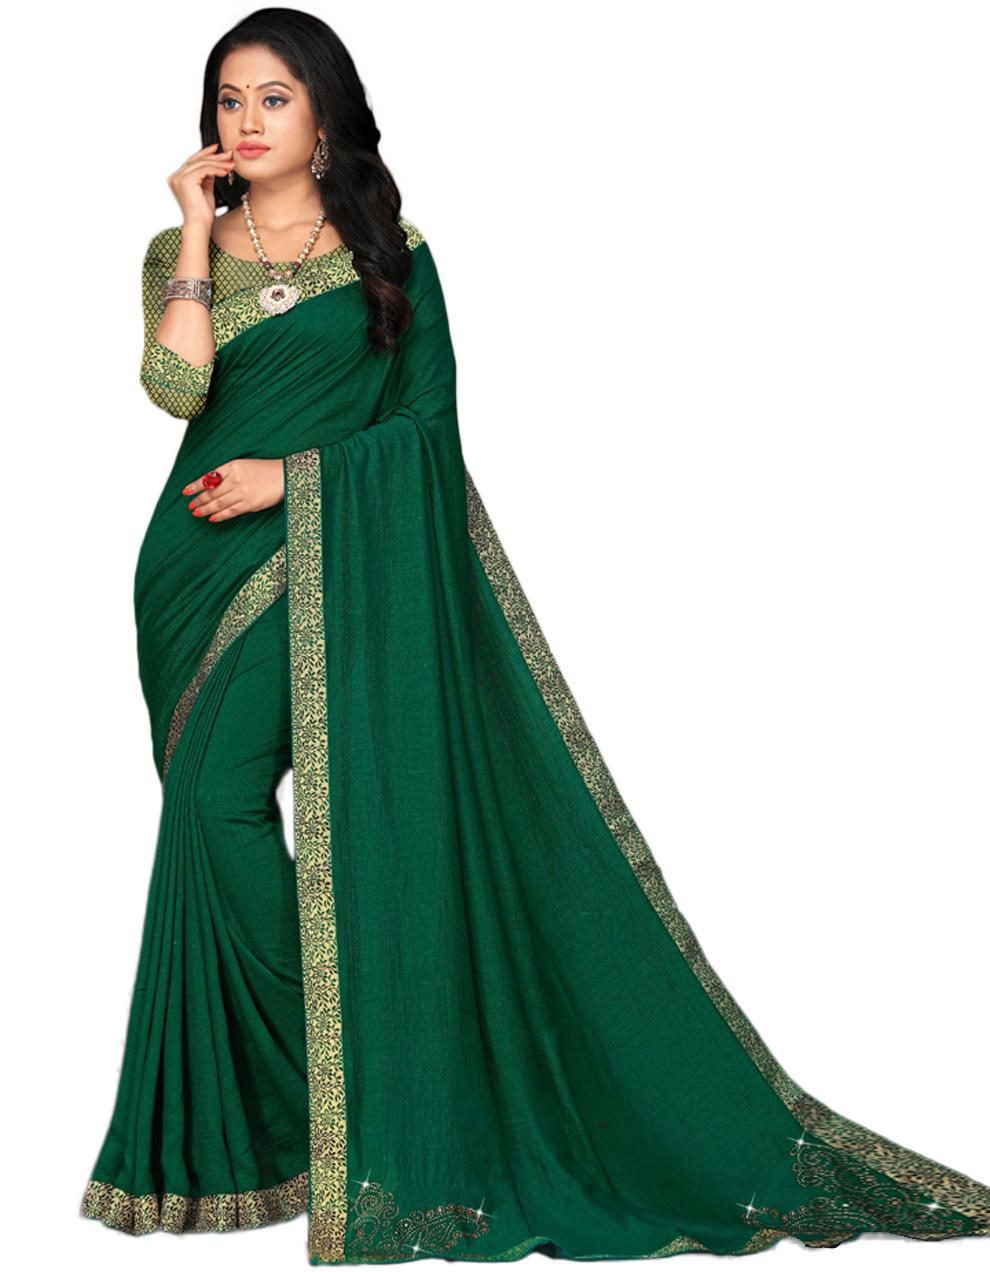 Green Vichitra silk Saree With Blouse IW24332